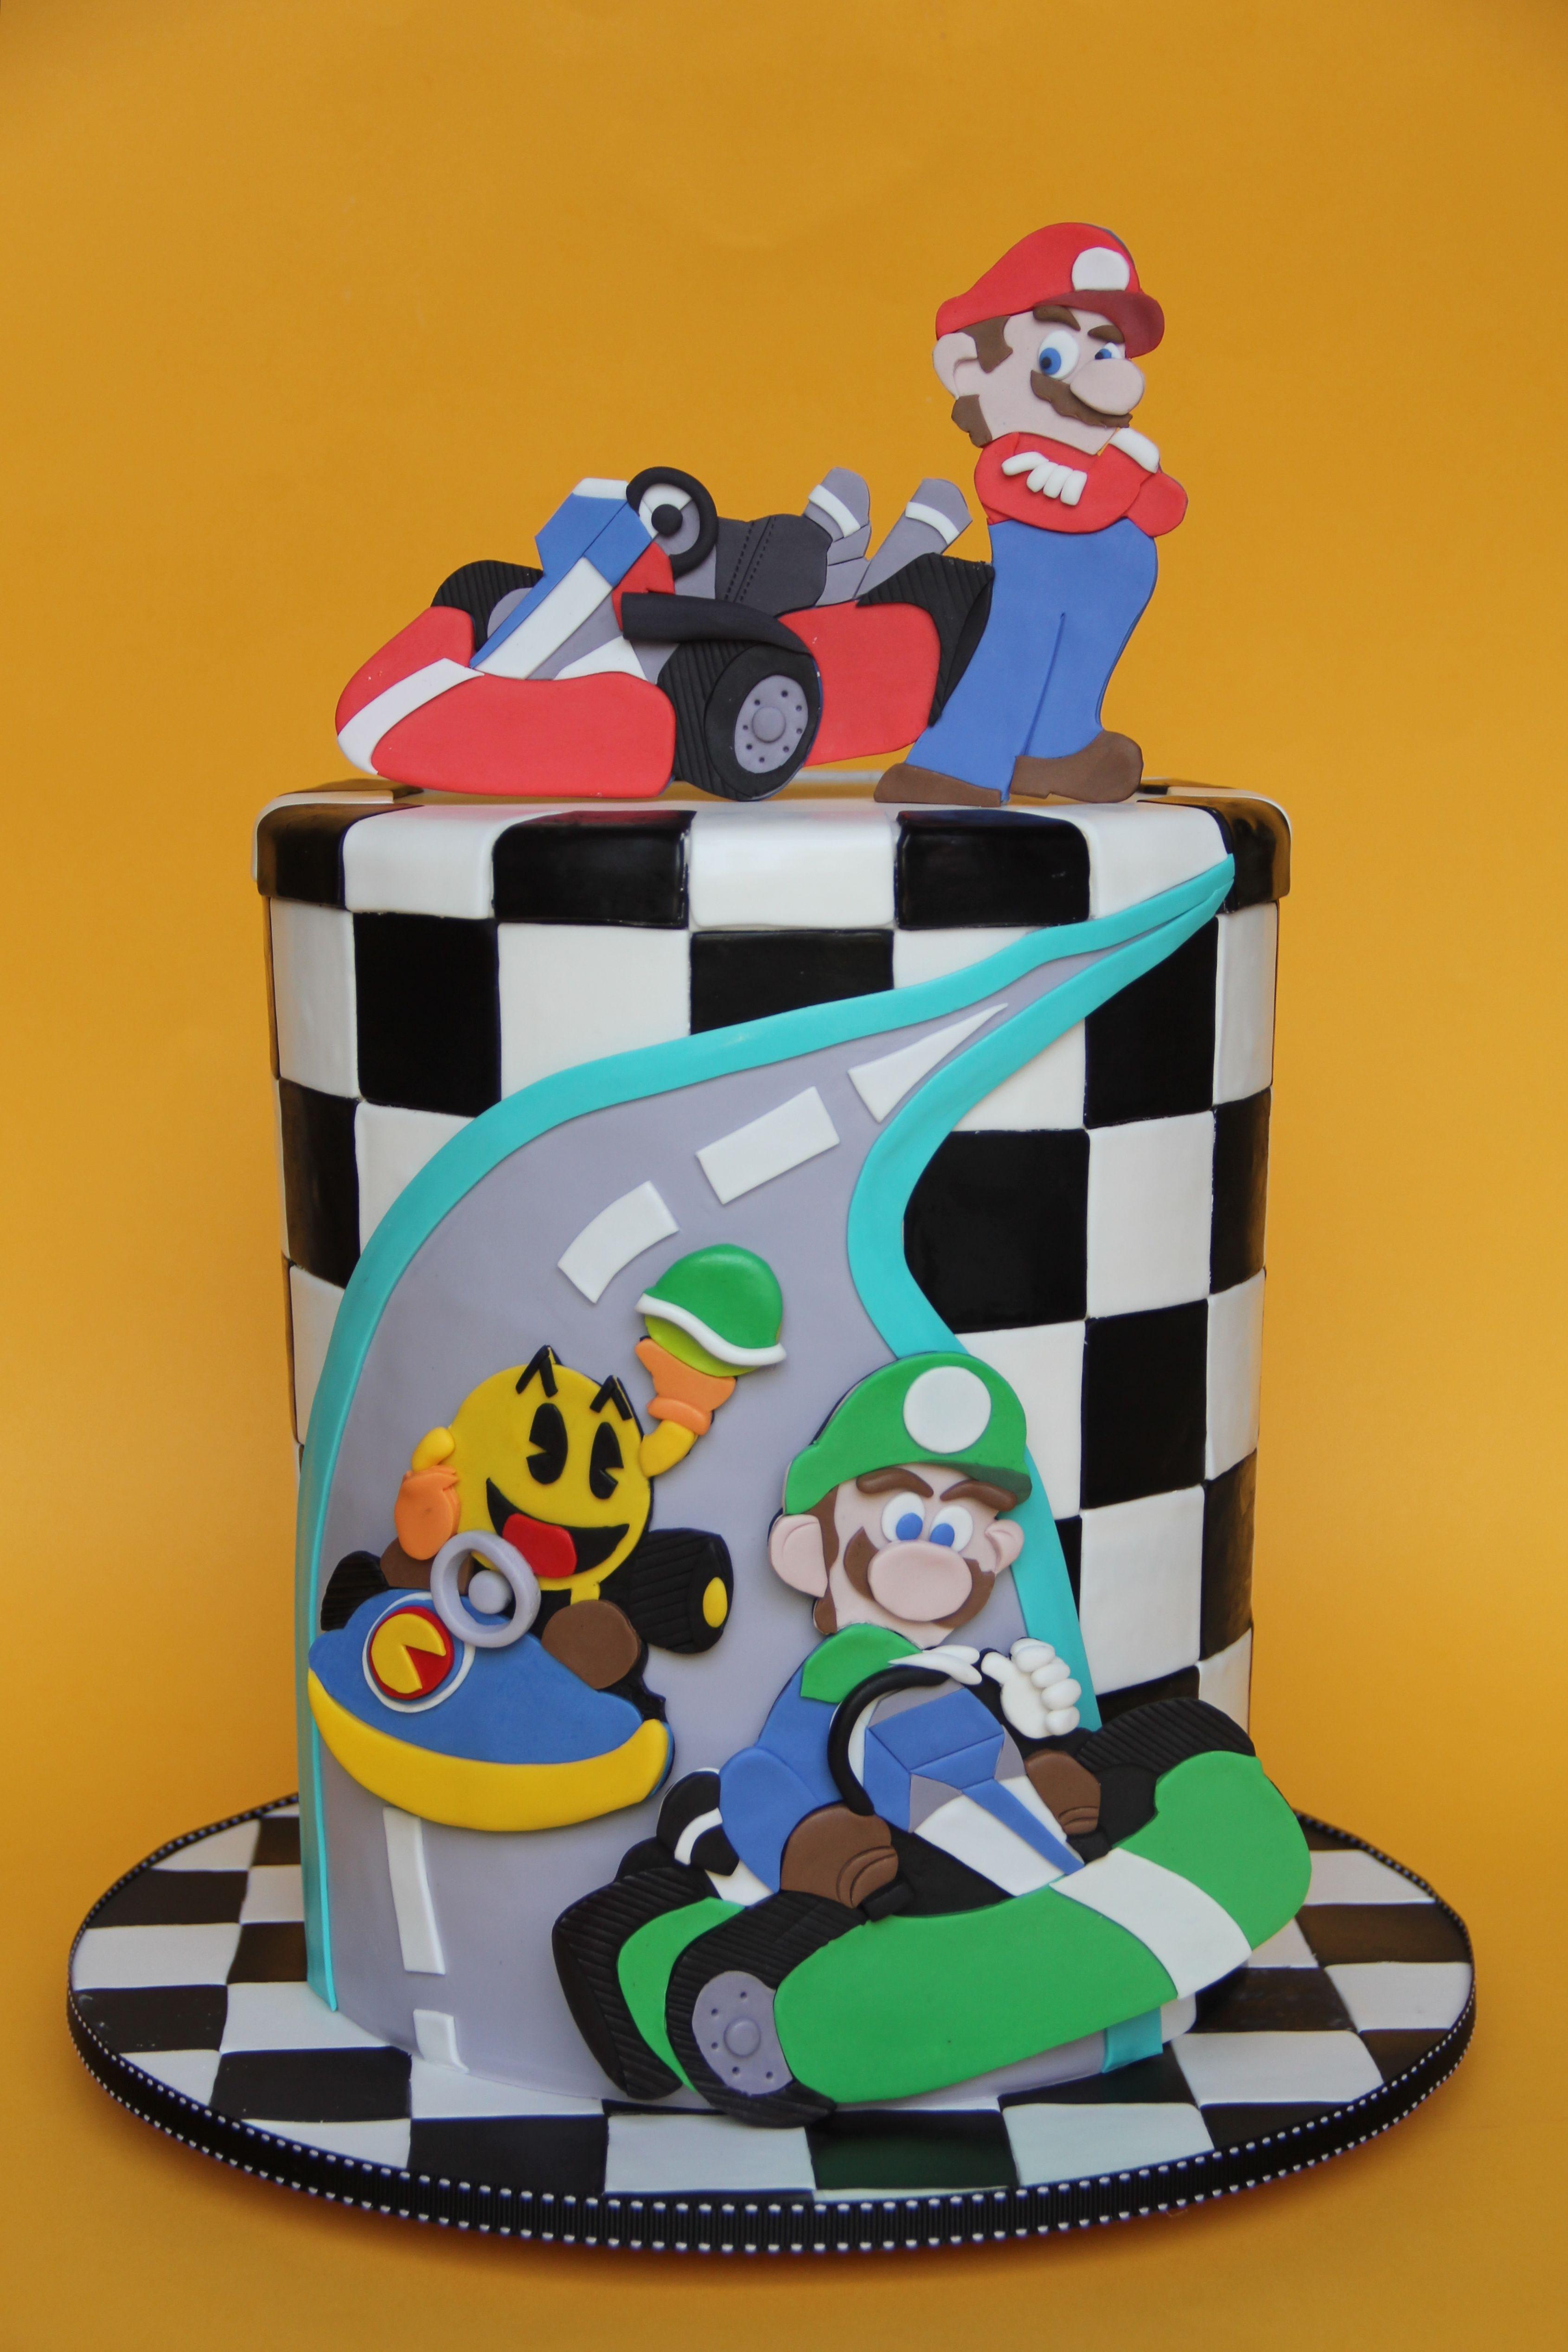 Sensational Mario Kart Cake Moxy Mx Con Imagenes Sombreros Locos Tortas Personalised Birthday Cards Akebfashionlily Jamesorg